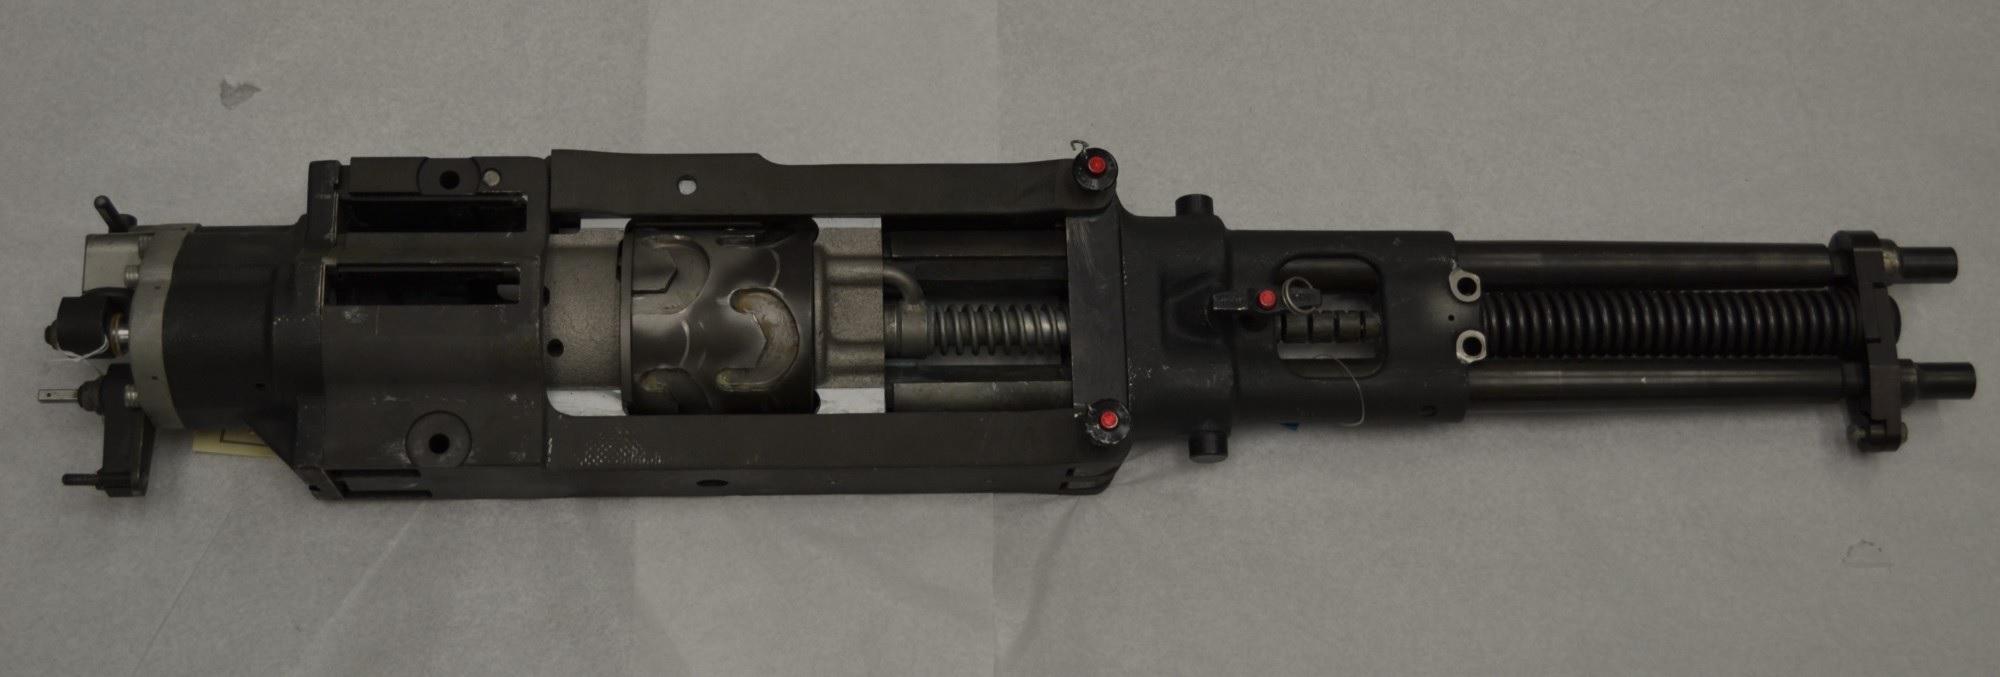 EX-17 Heligun